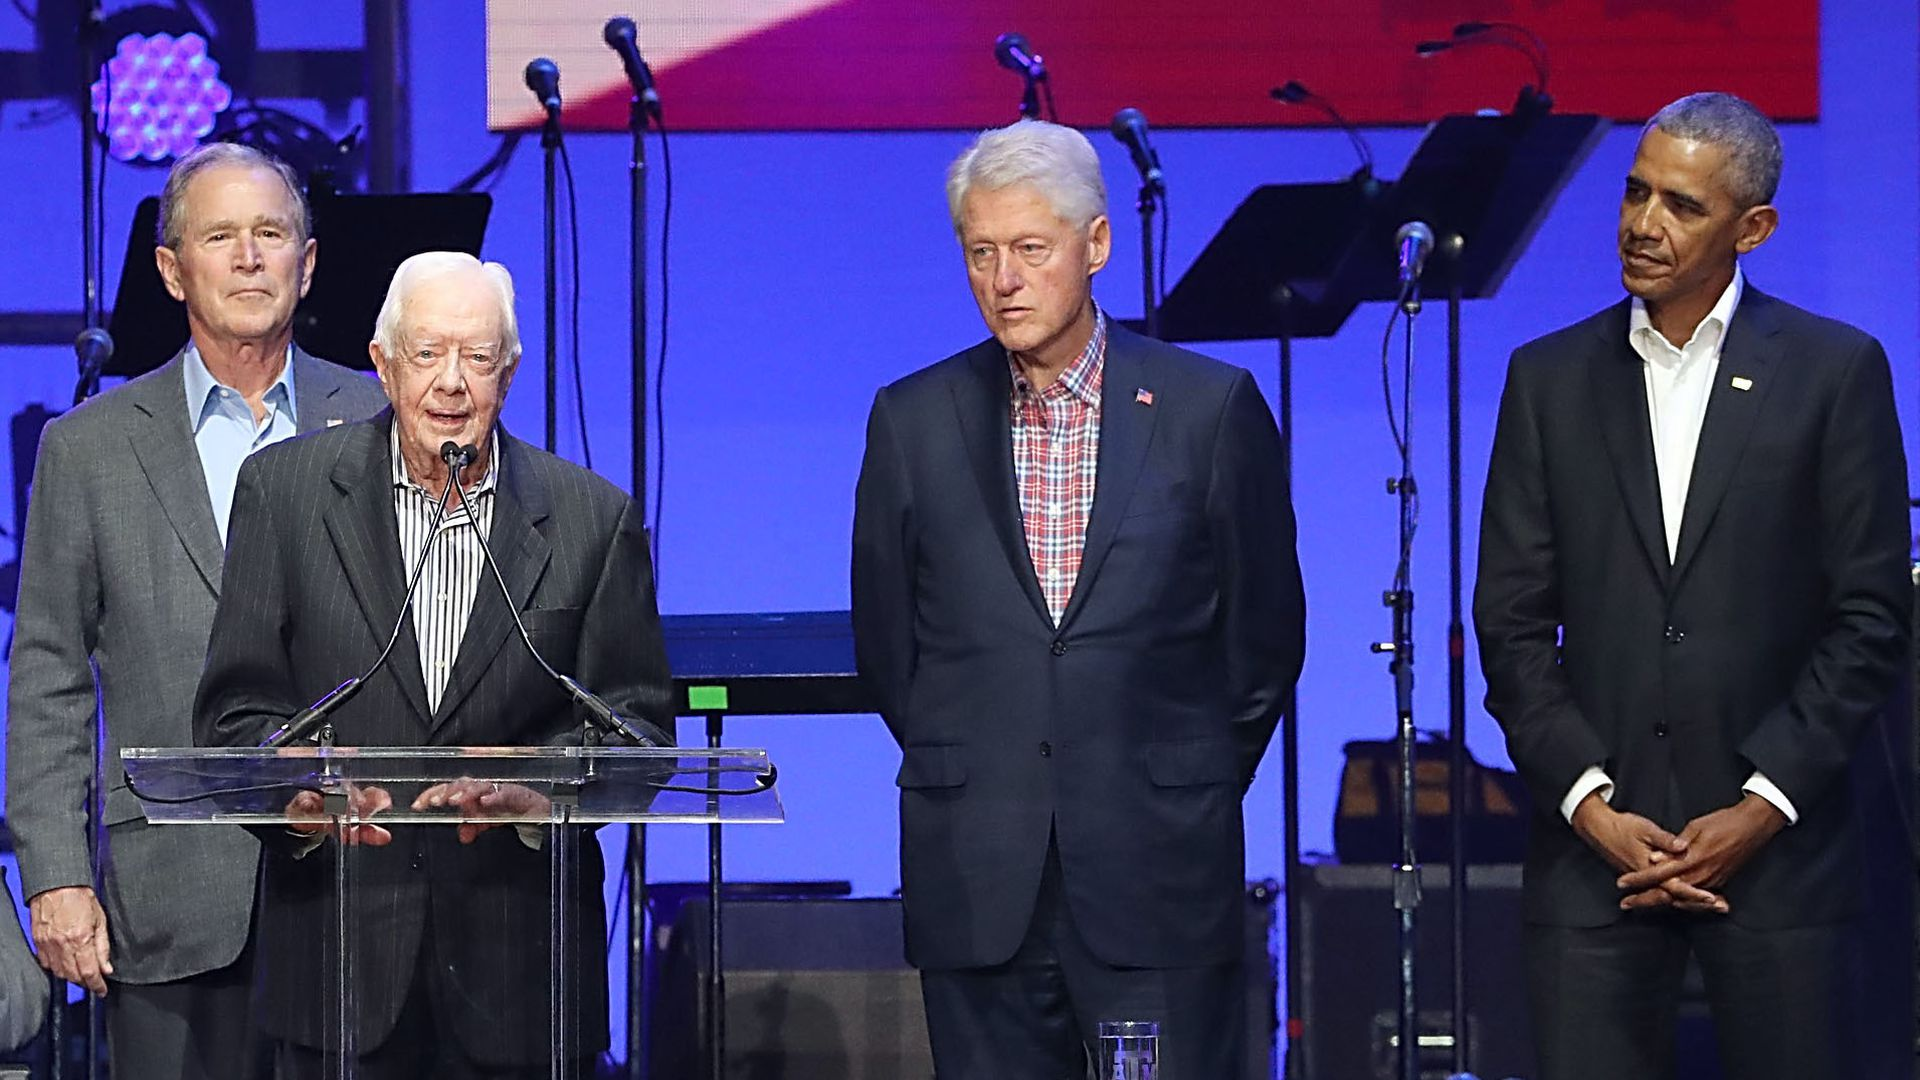 Obama, Carter, Bush, Bill Clinton slam U.S. Capitol insurrection - Axios